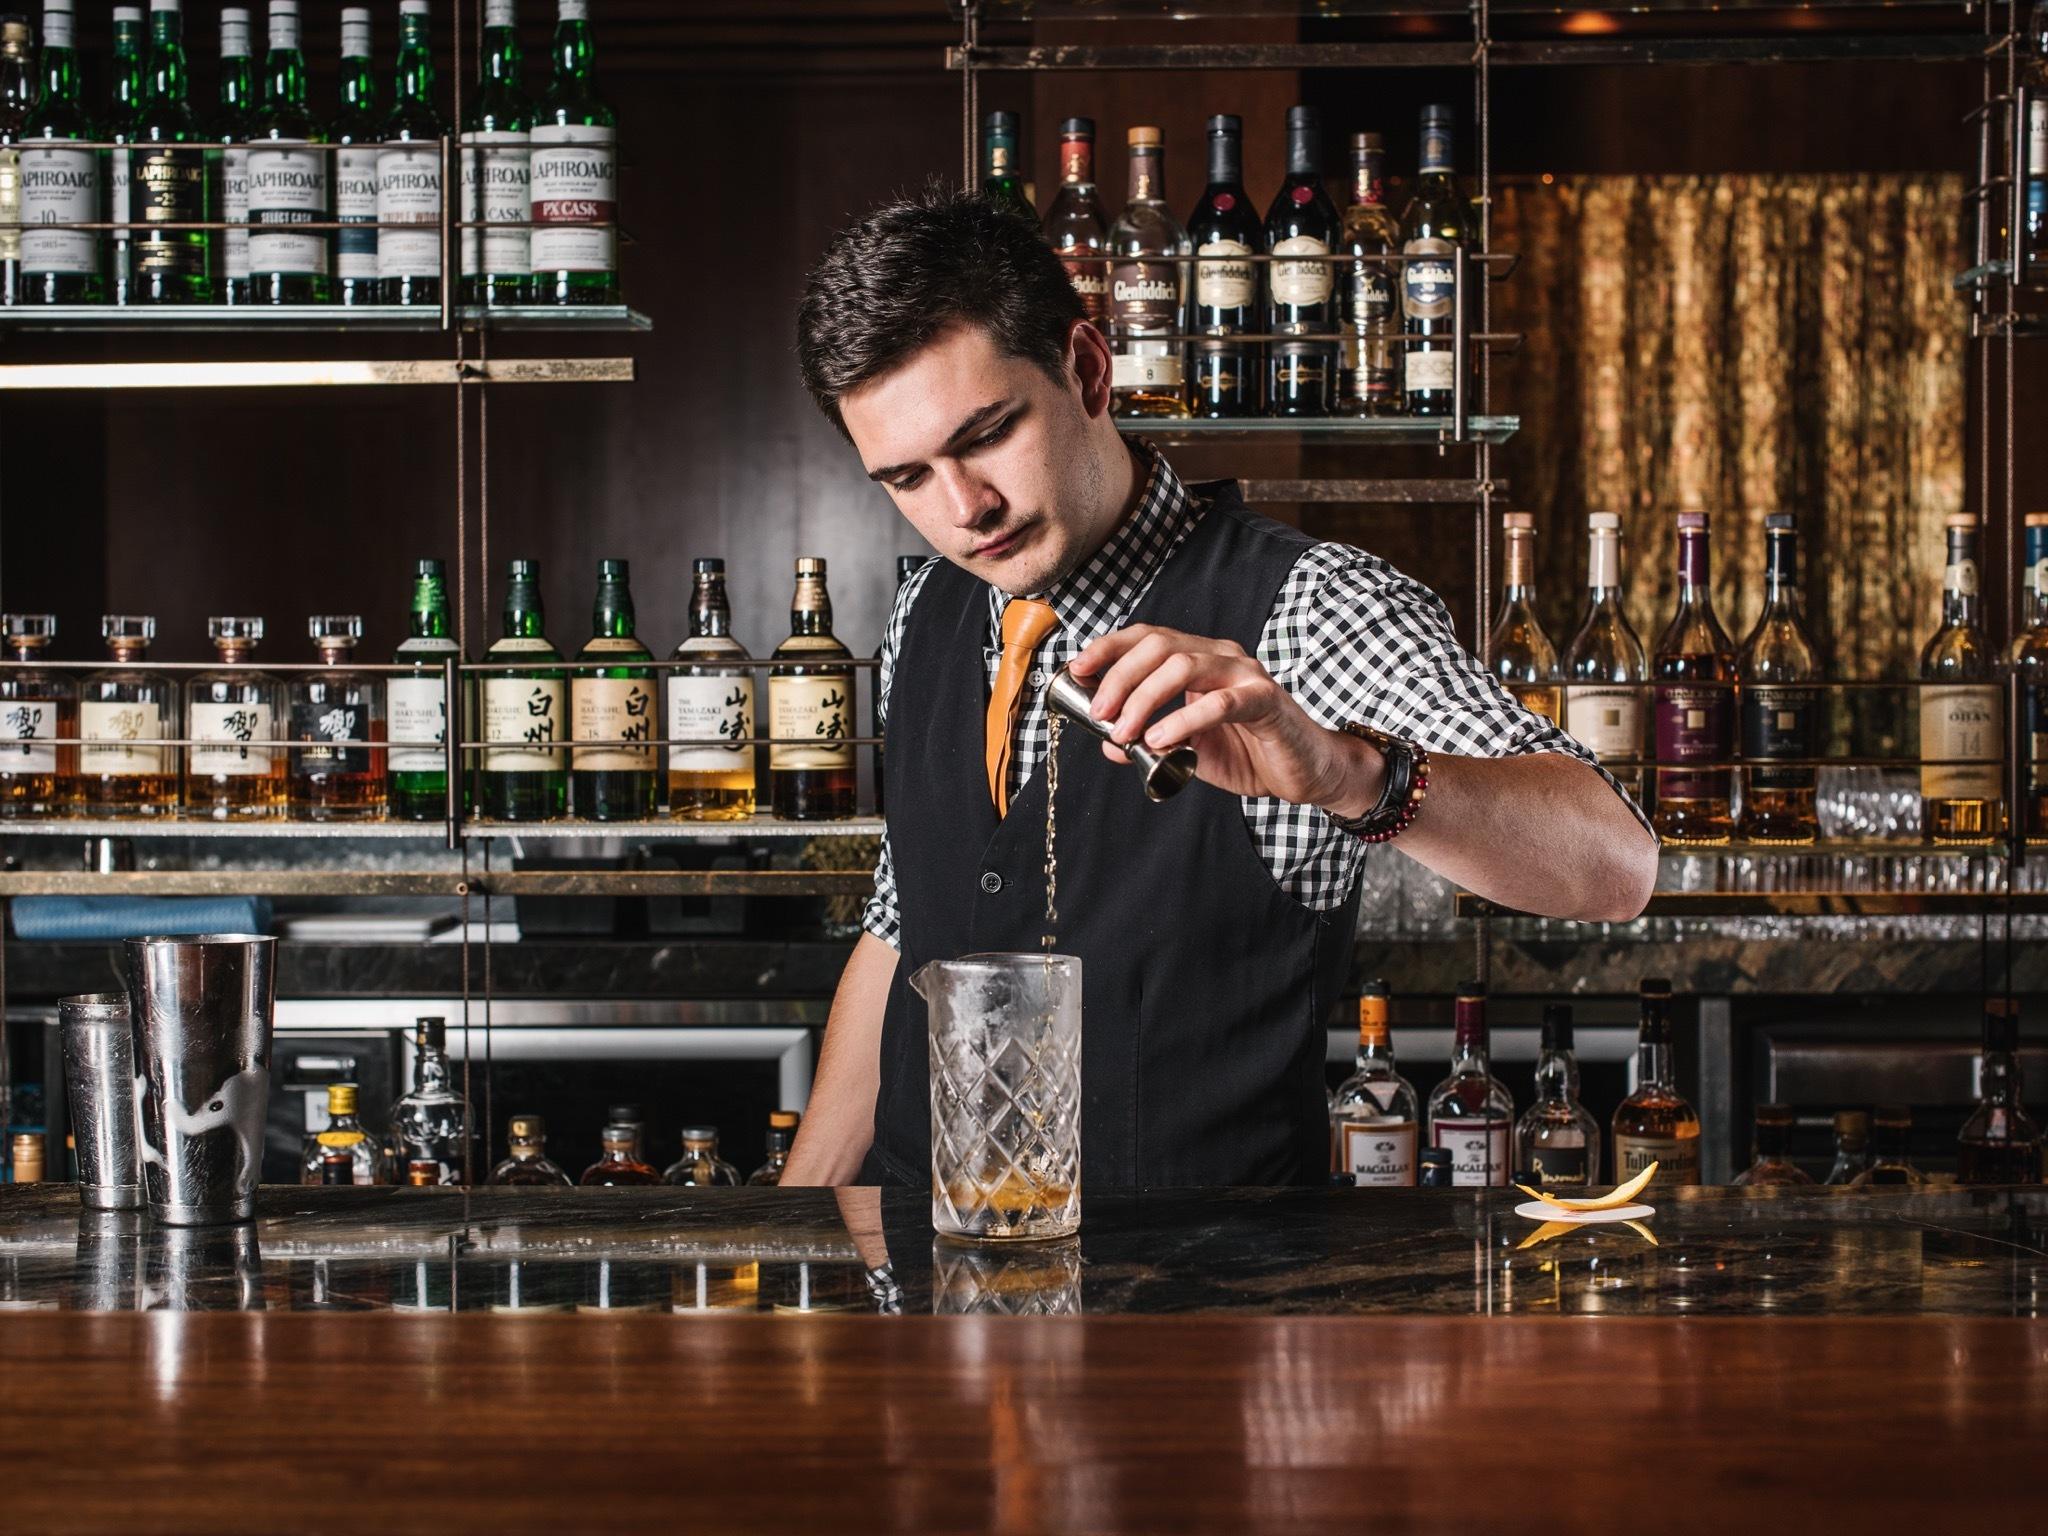 Bartender at Grain Bar